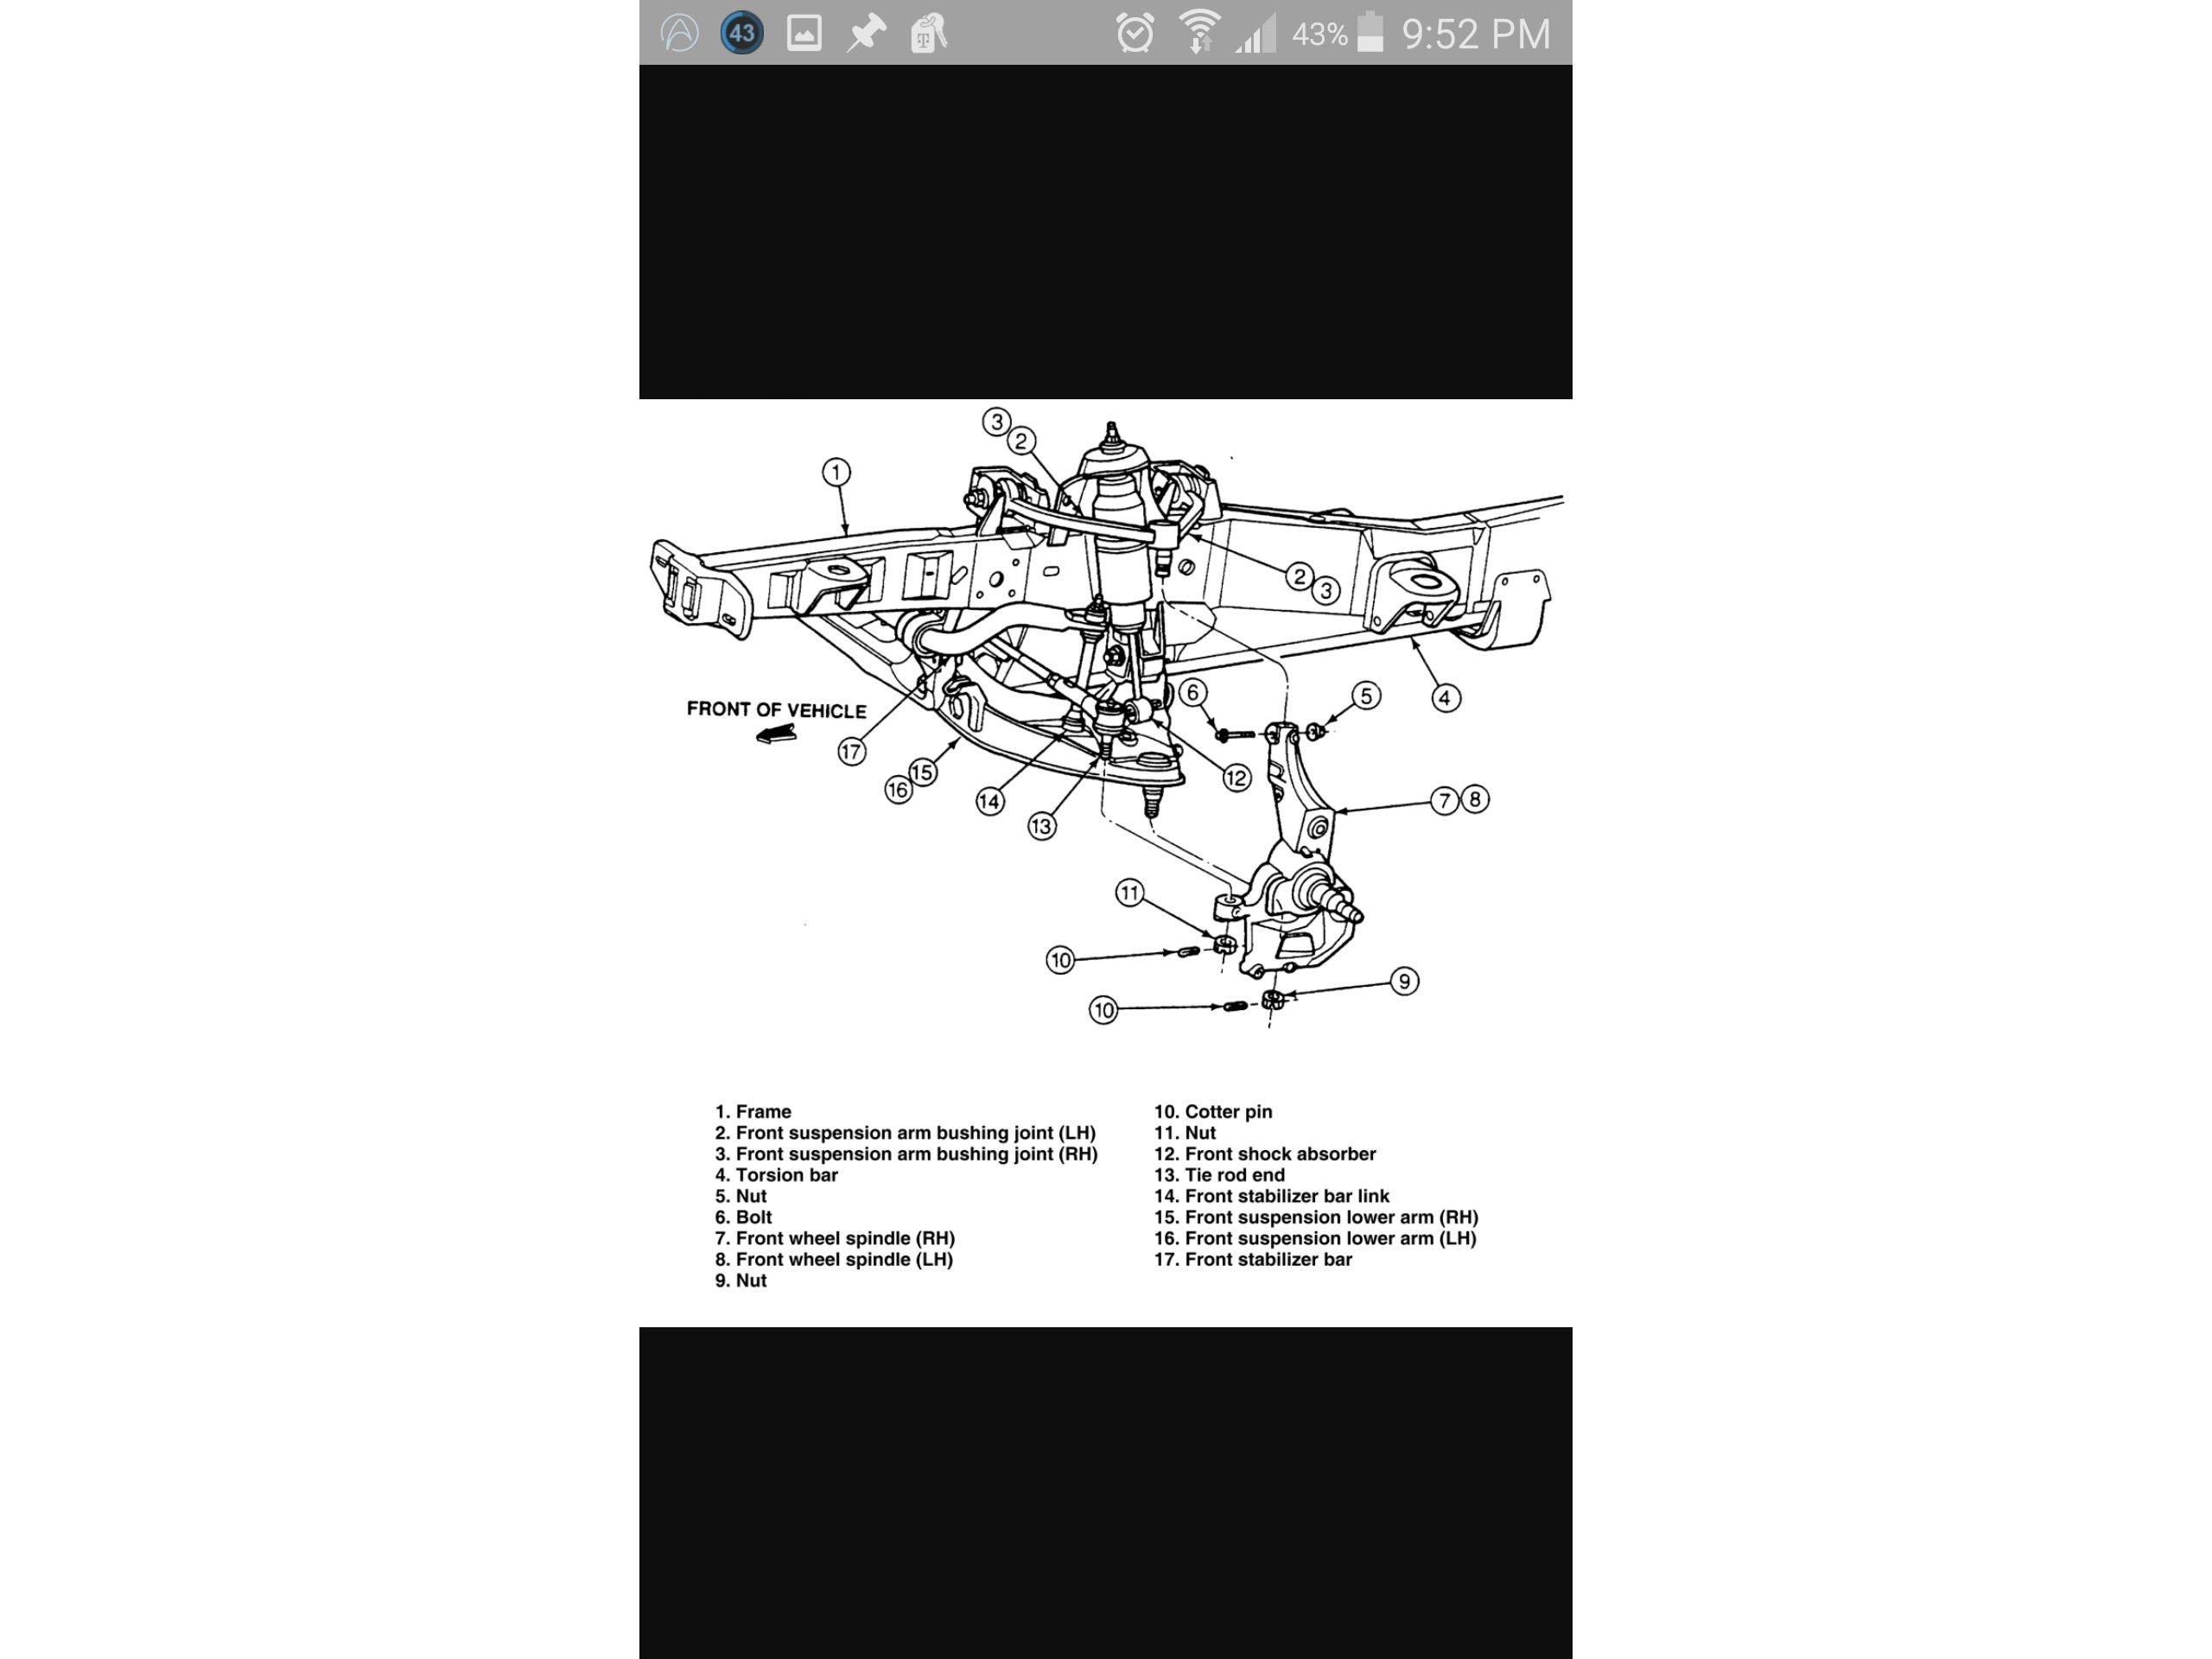 1996 ford ranger front suspension diagram cooker wiring diagrams uk disassembling 1989 1992 1990